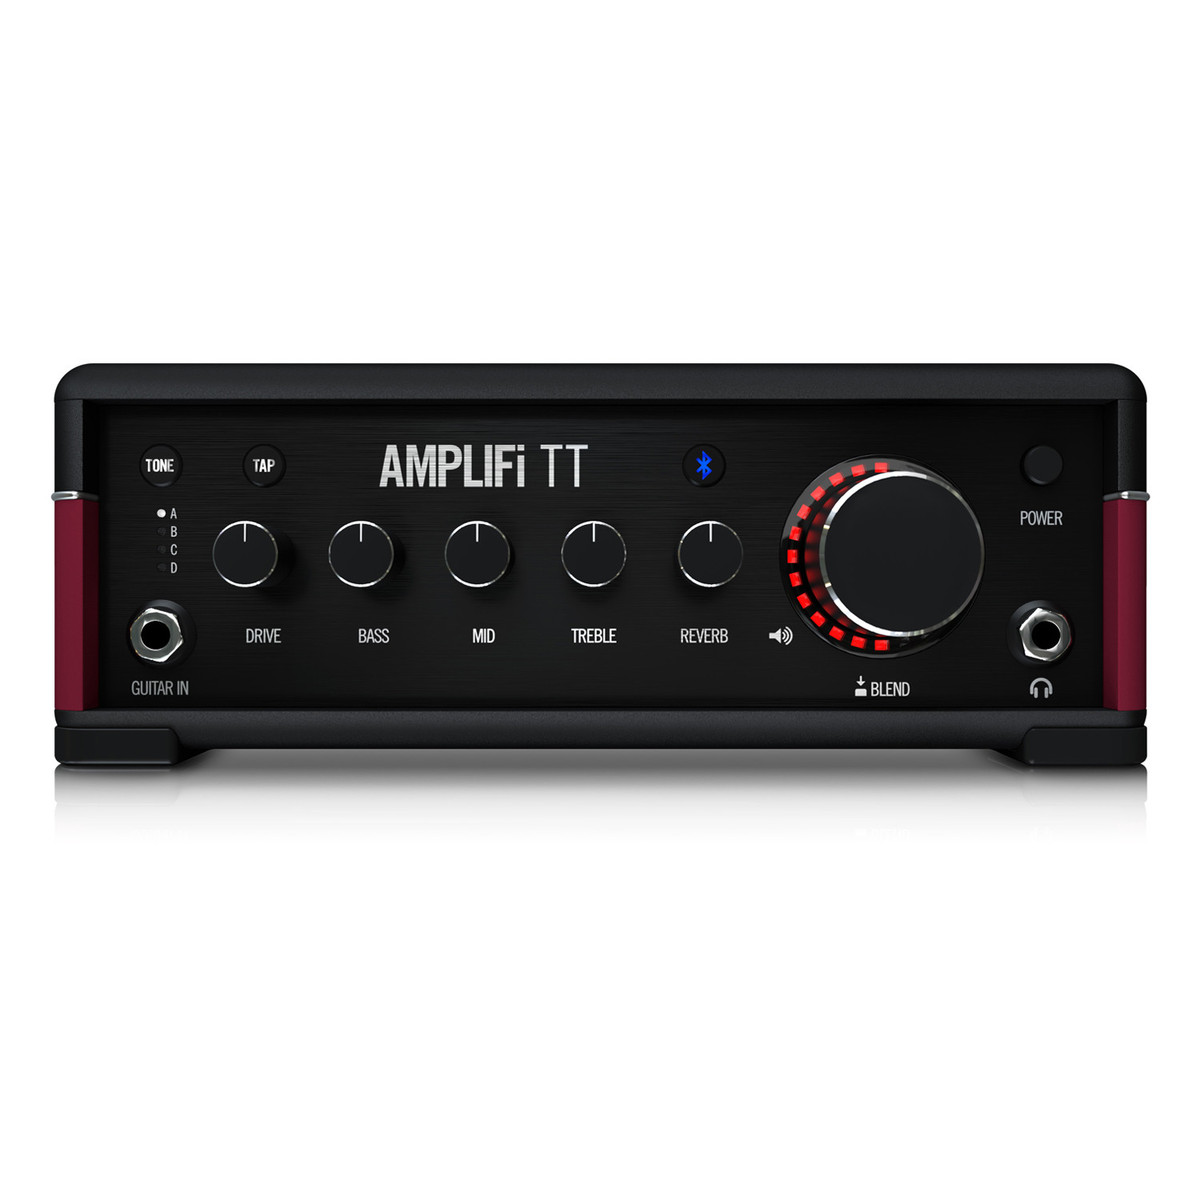 line 6 amplifi tt at gear4music. Black Bedroom Furniture Sets. Home Design Ideas